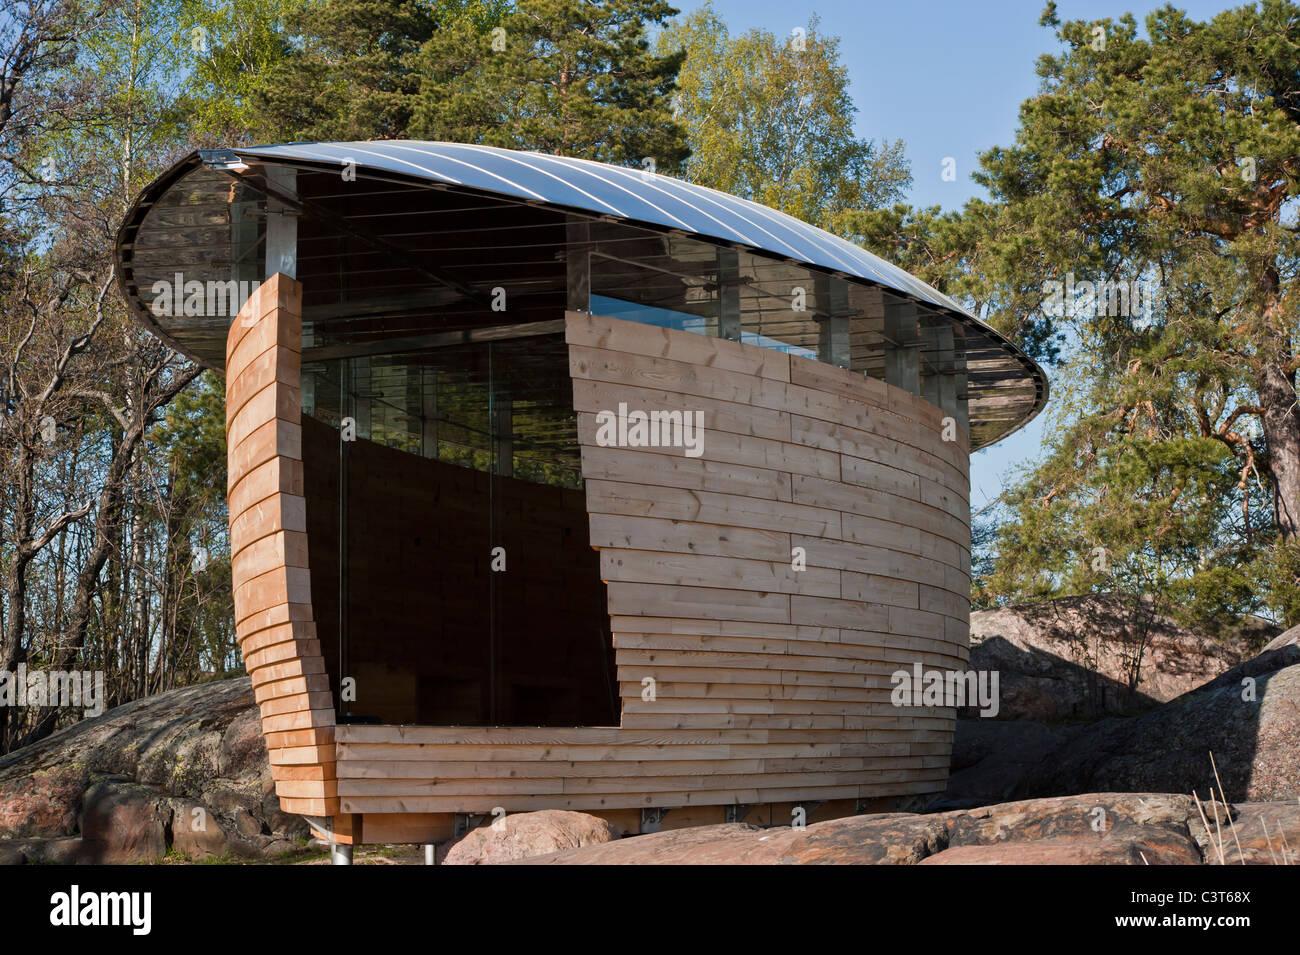 Nature inspired building in Helsinki - Stock Image